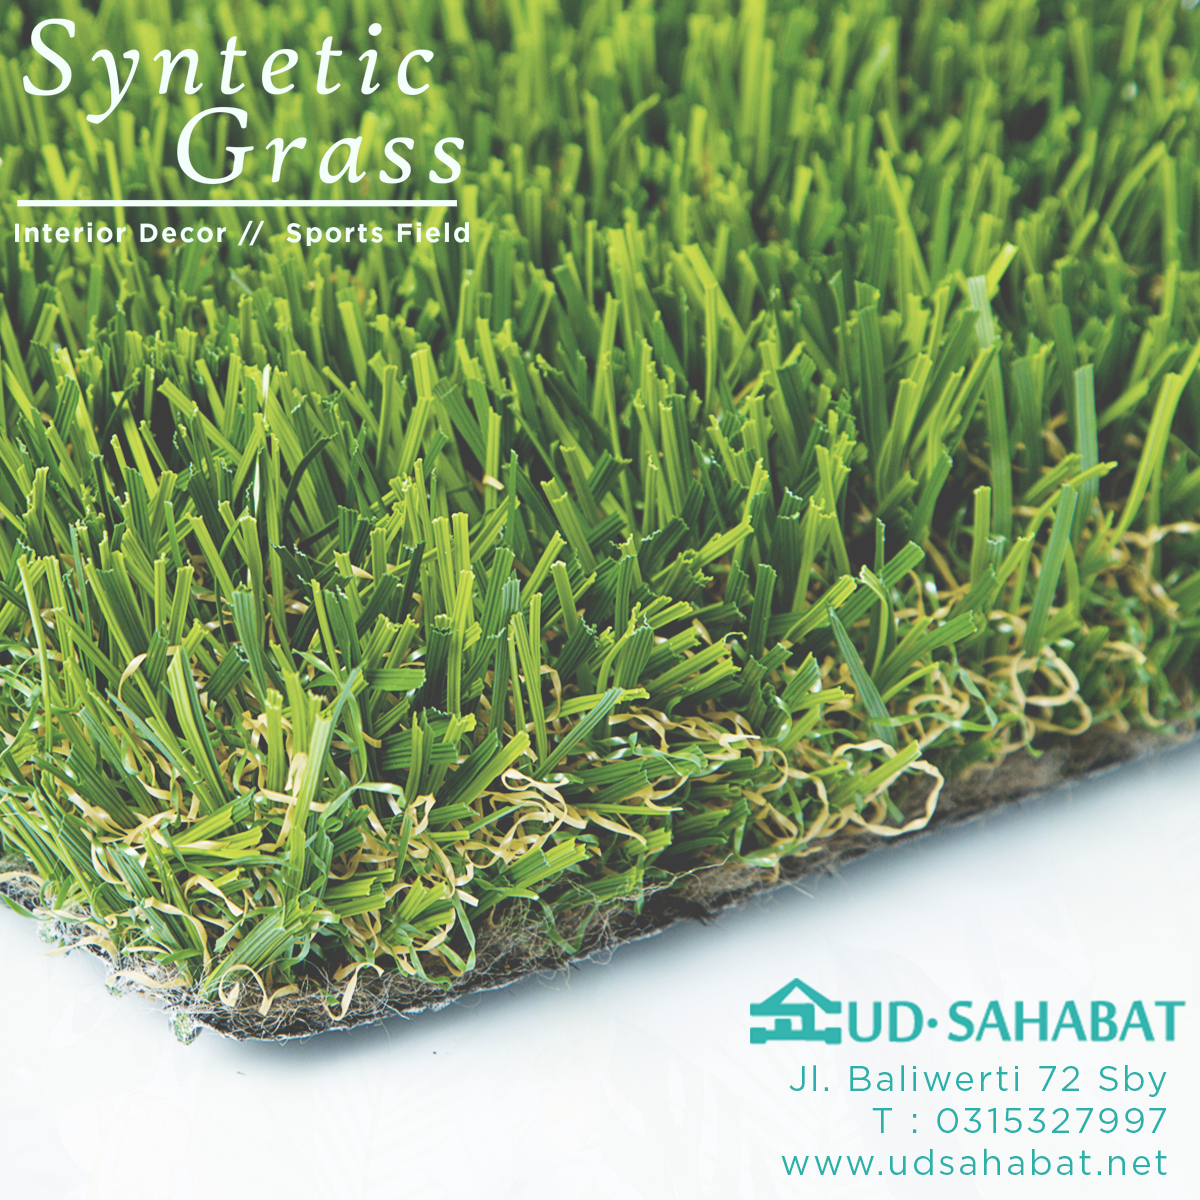 rumput palsu buatan ud sahabat baliwerti surabaya